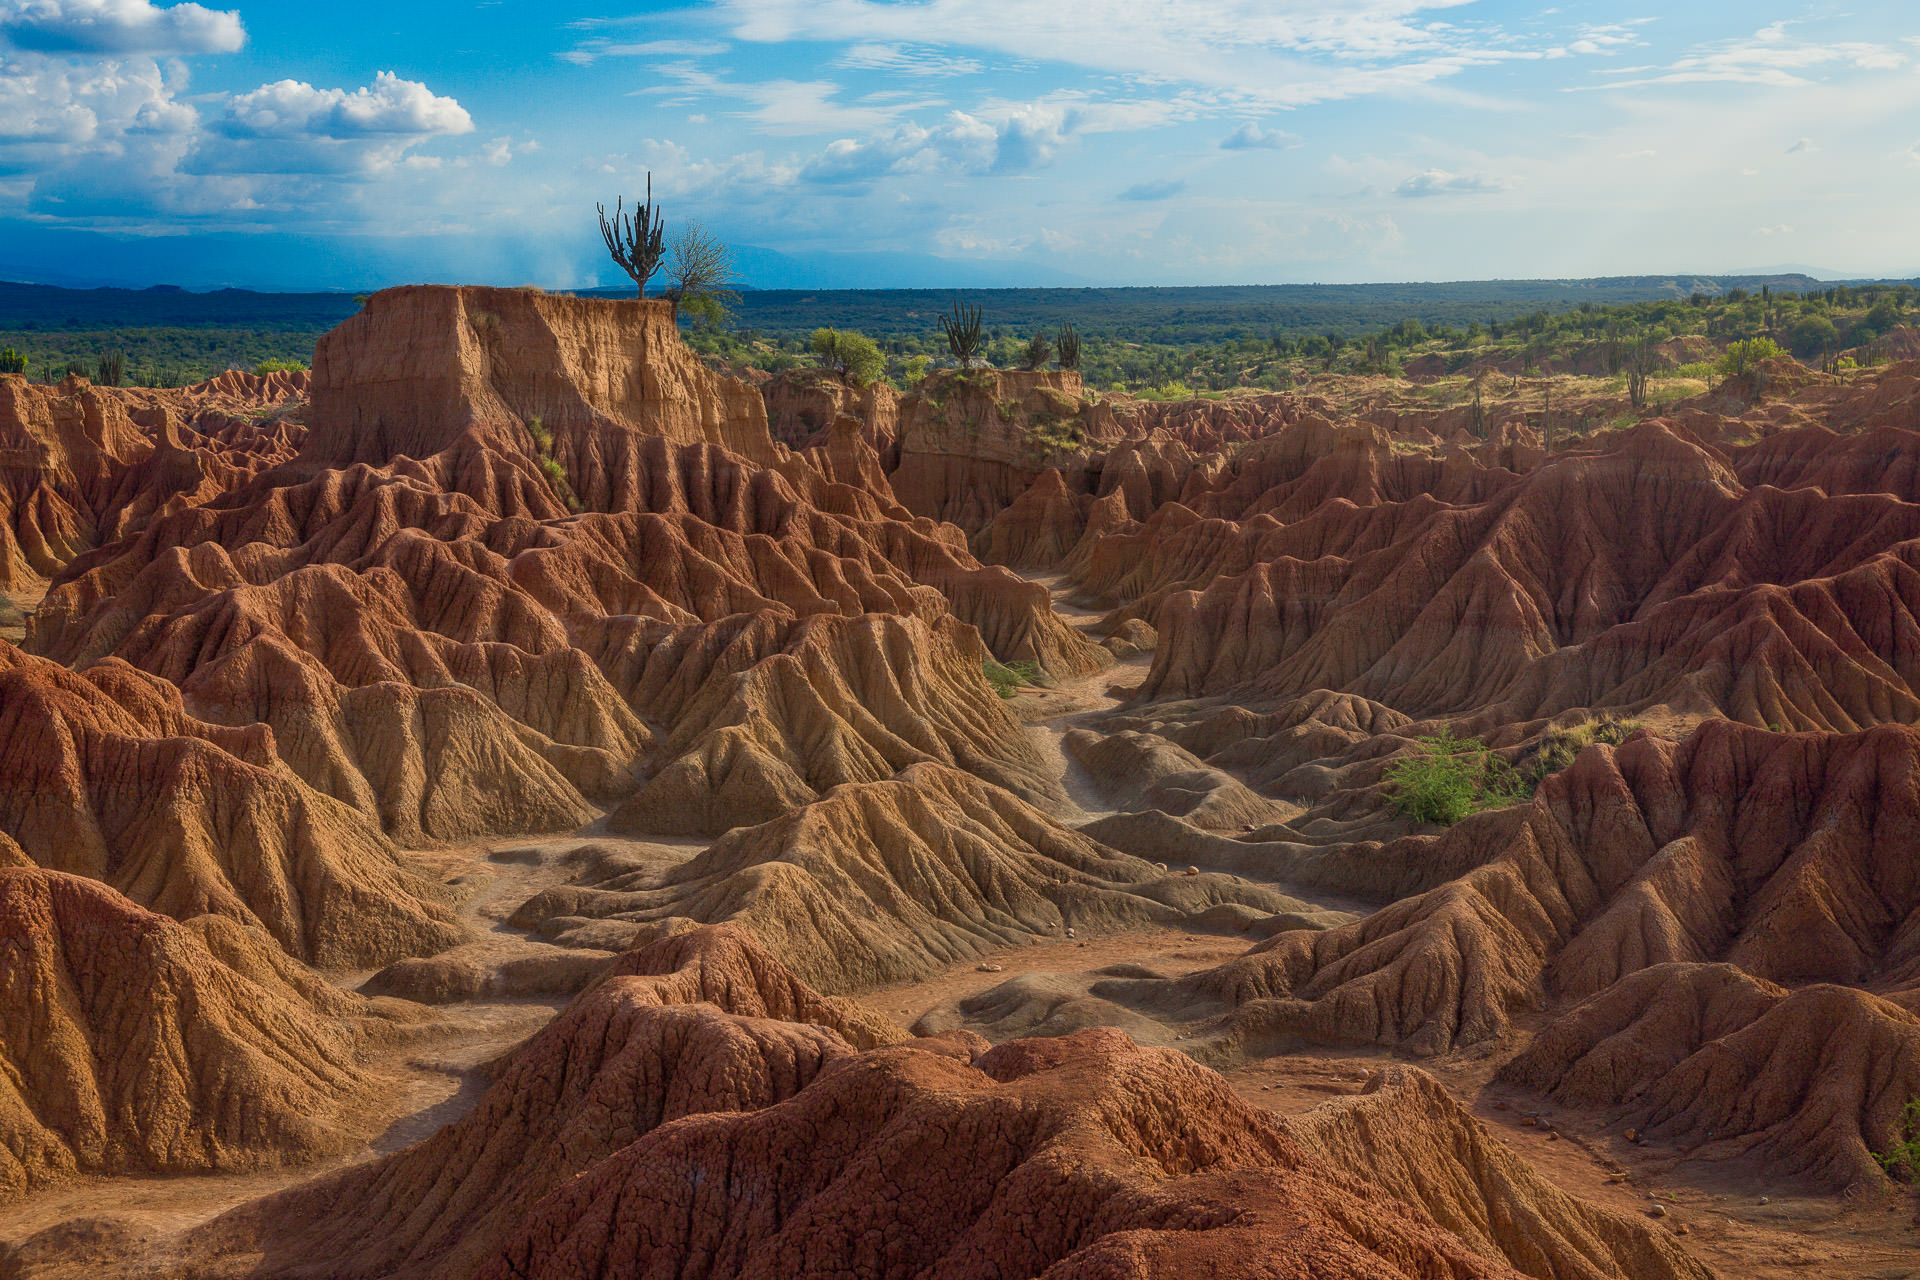 Desert de Tatacoa © tristan quevilly